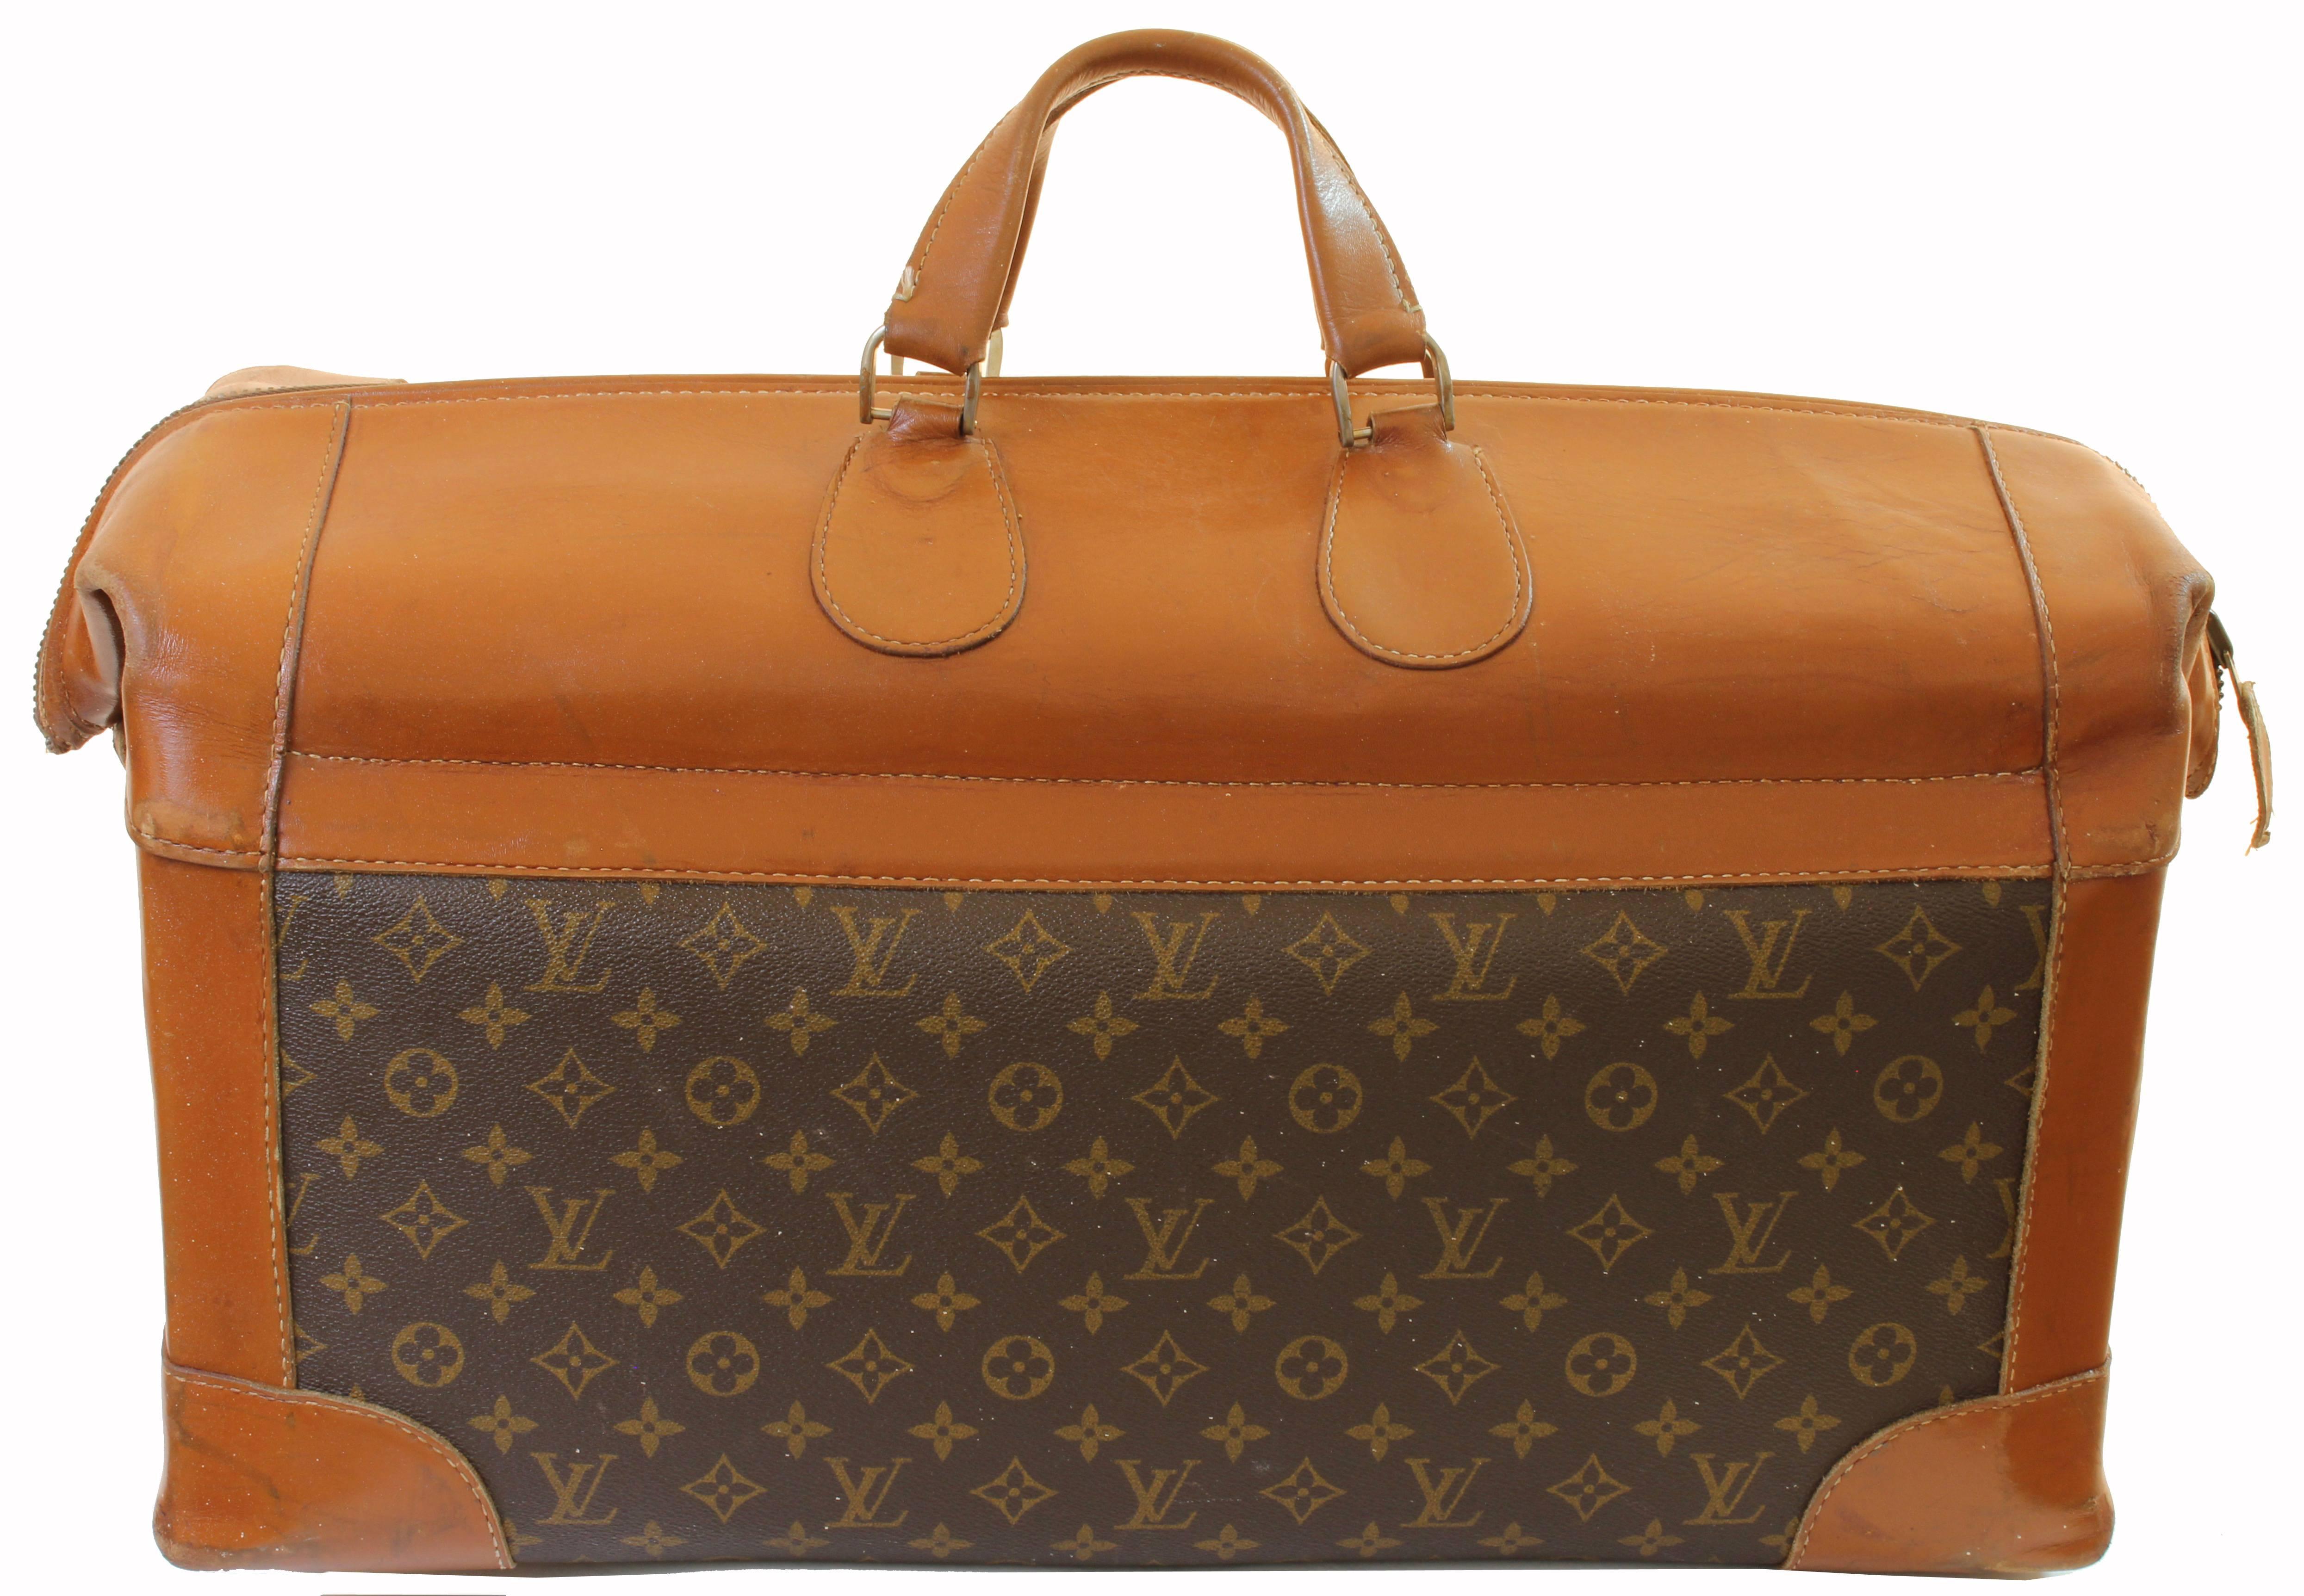 Louis Vuitton Monogram Orange Embossed Patent Leather Suitcase E5EPKg6Kd